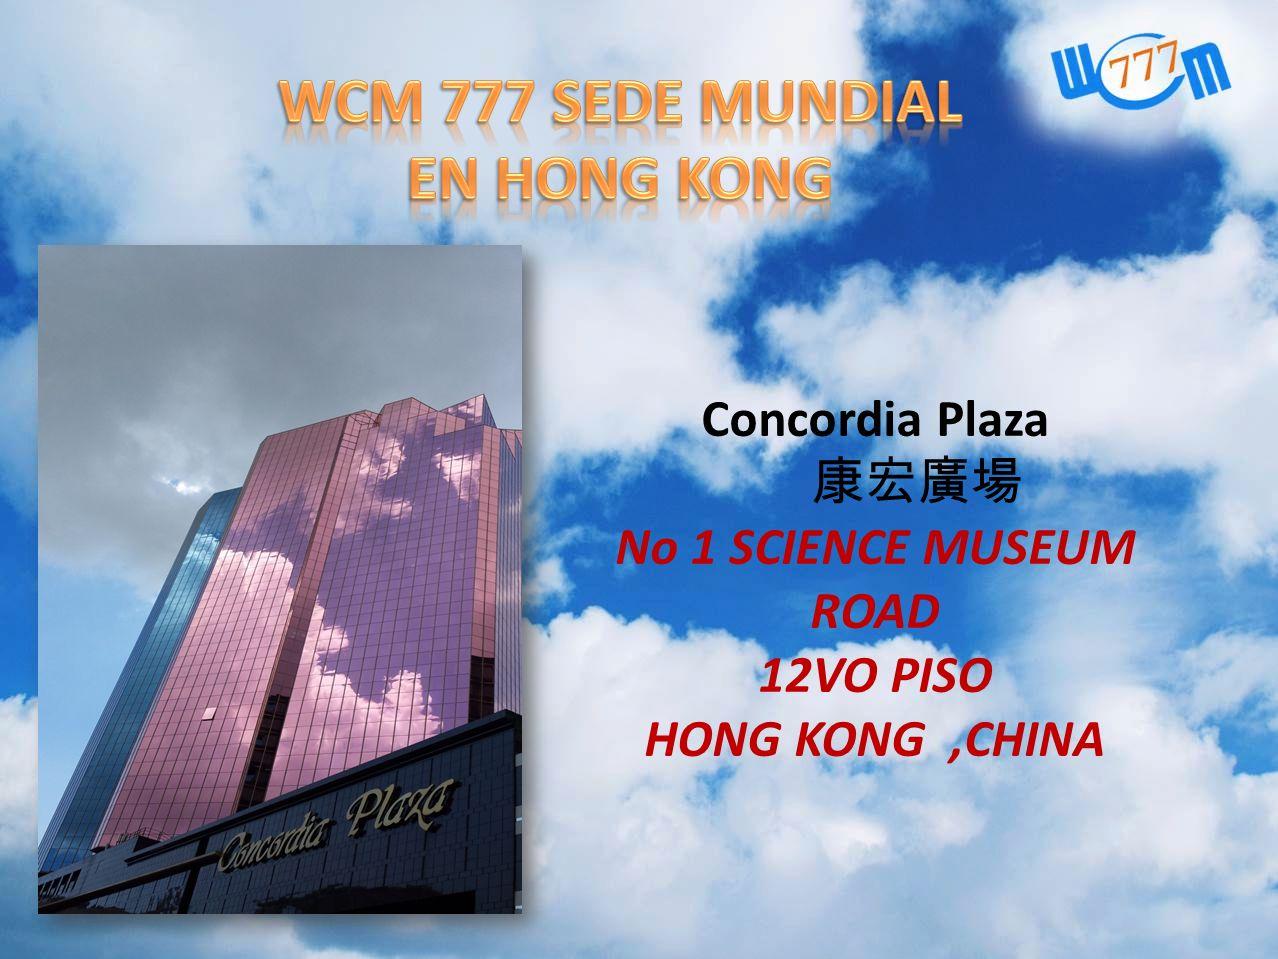 WCM 777 SEDE MUNDIAL EN HONG KONG